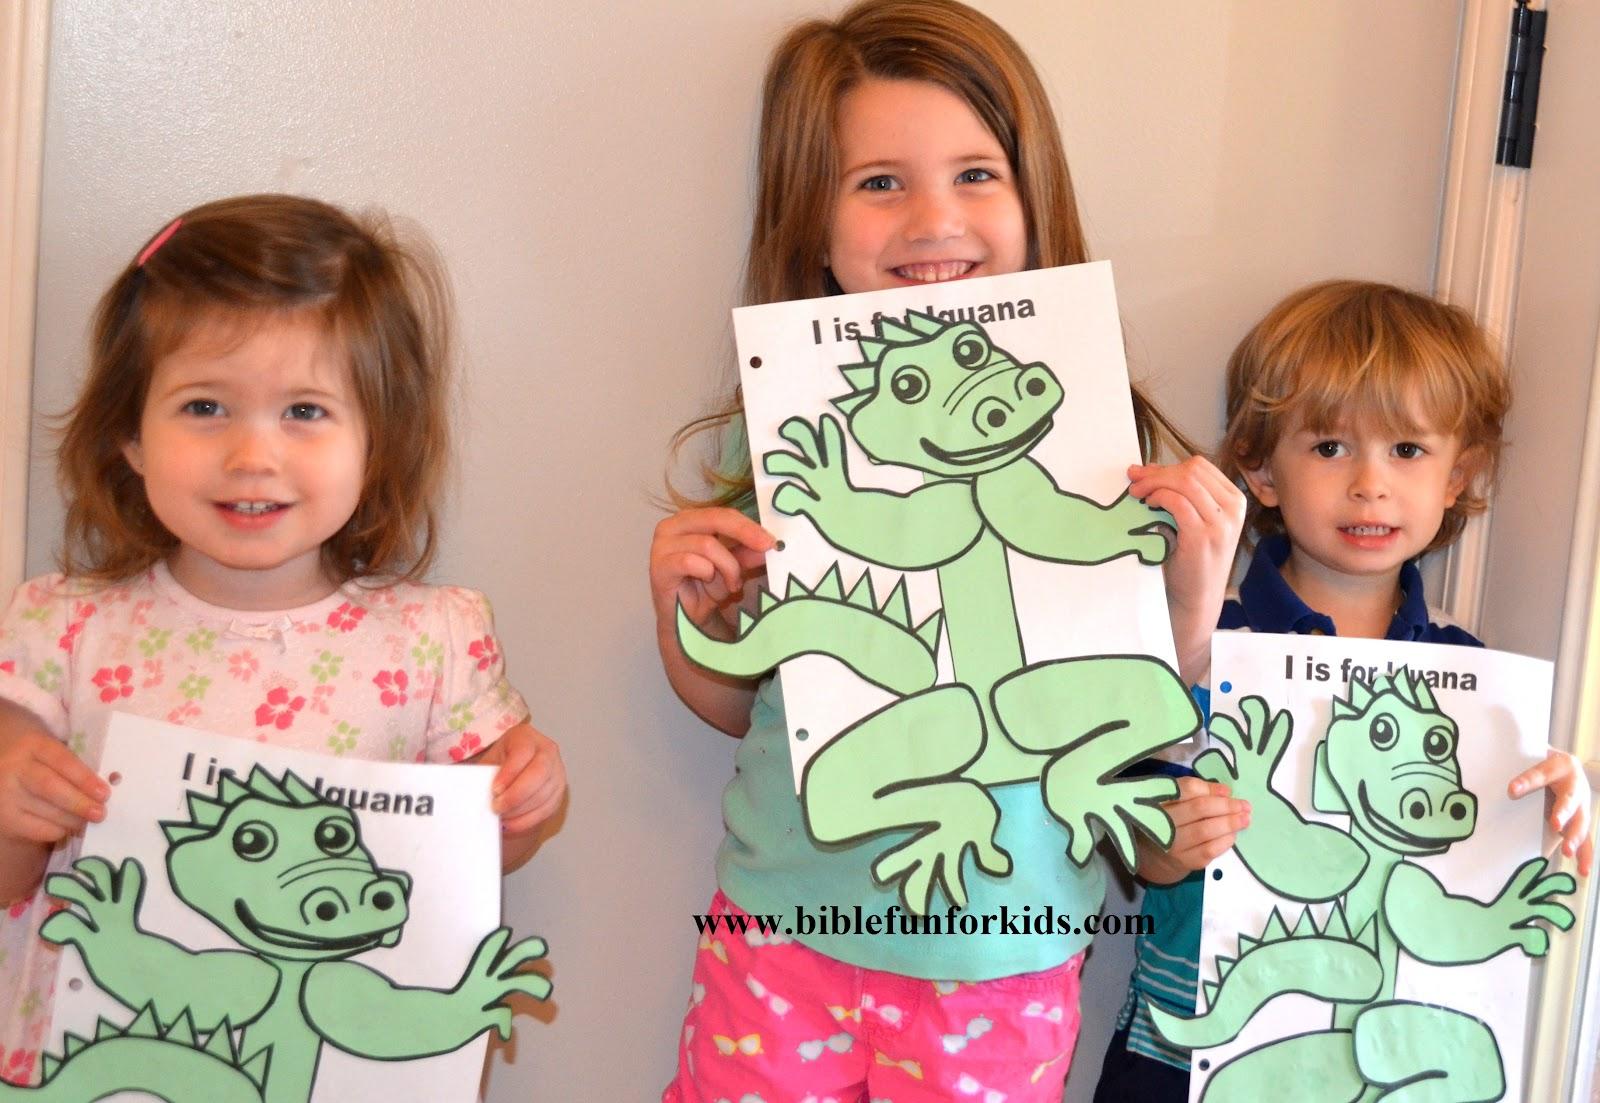 Bible Fun For Kids Preschool Alphabet I Is For Isaiah